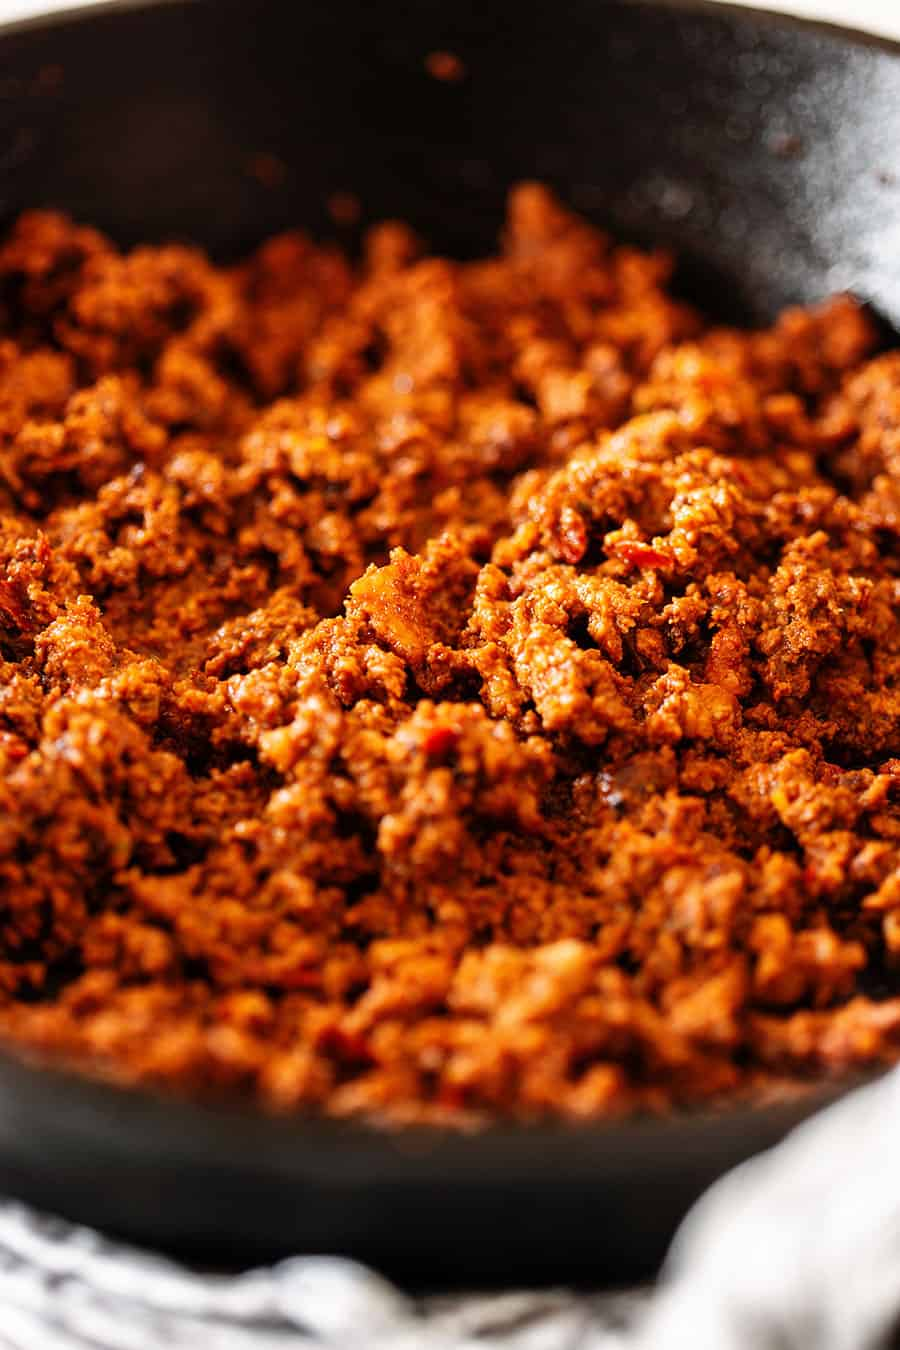 Fried chorizo on an iron-cast skillet.